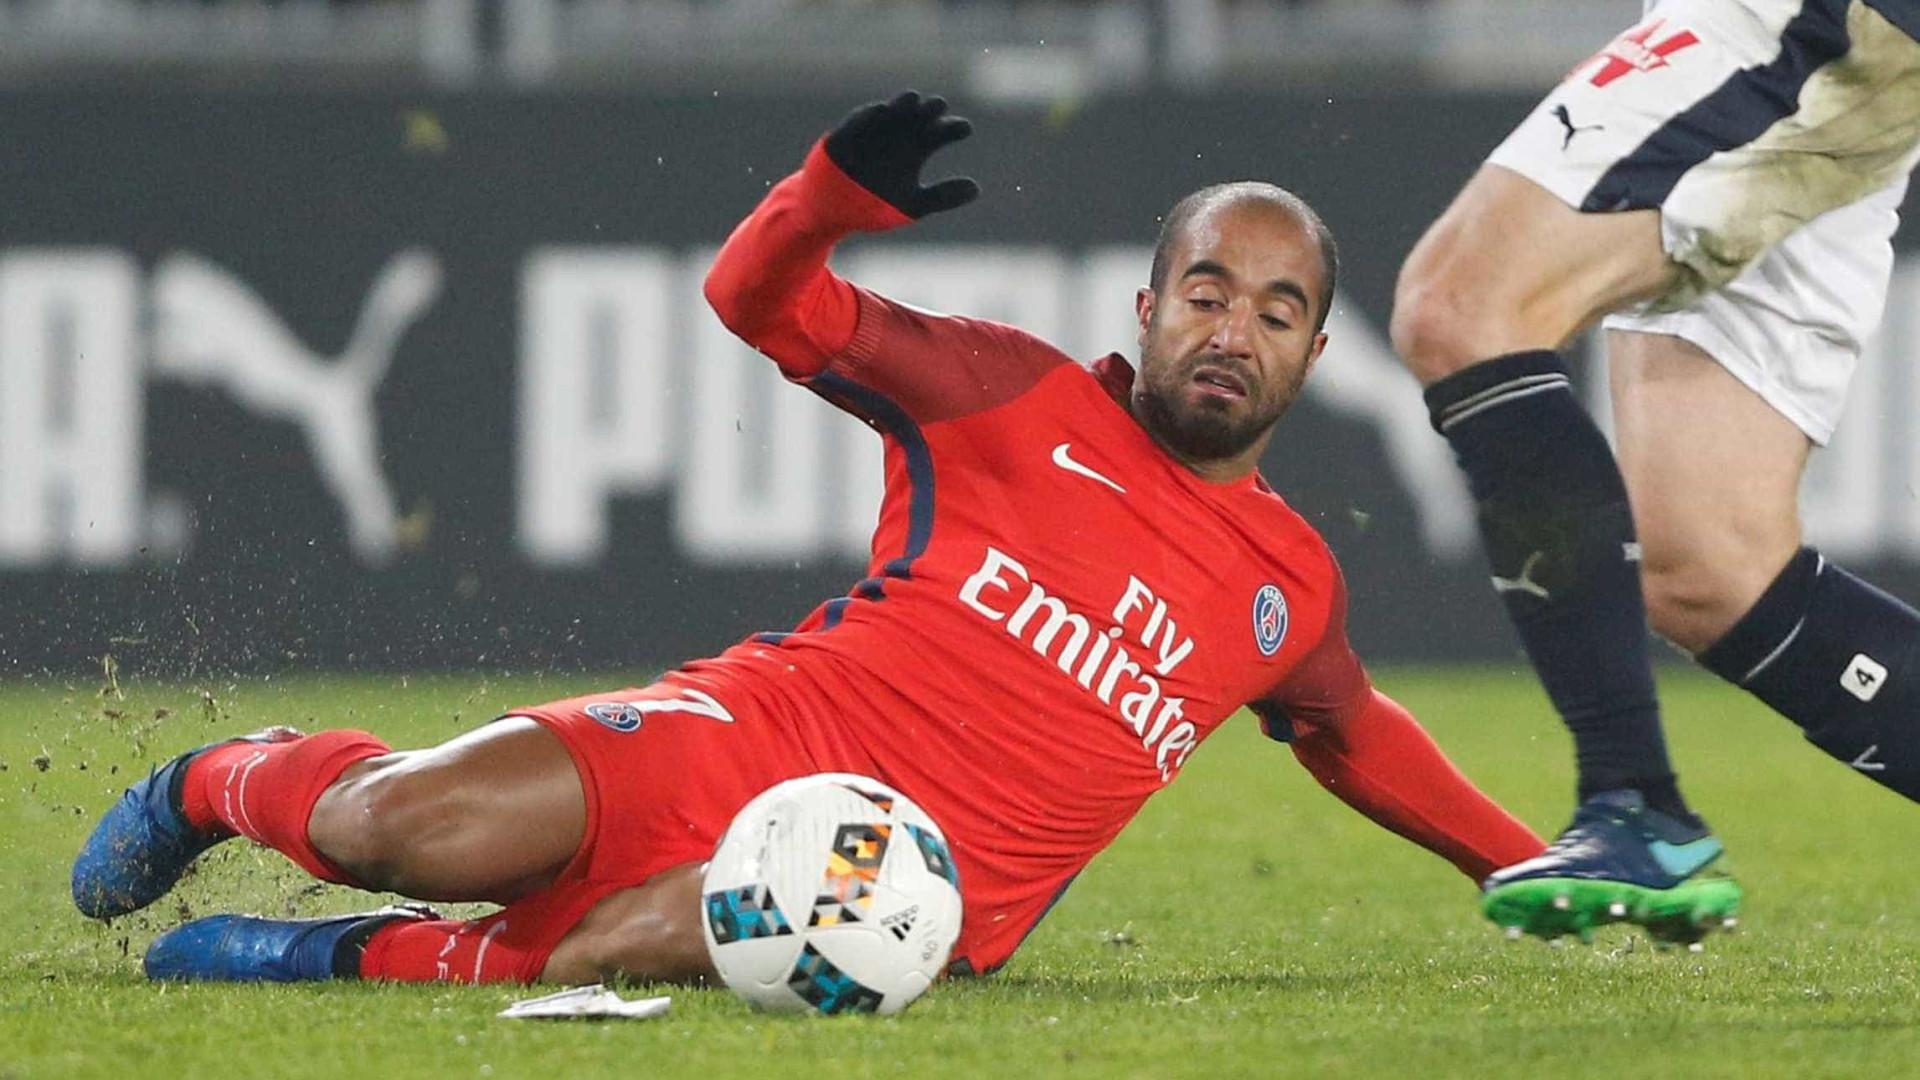 PSG sugere empréstimo, mas Lucas Moura recusa proposta